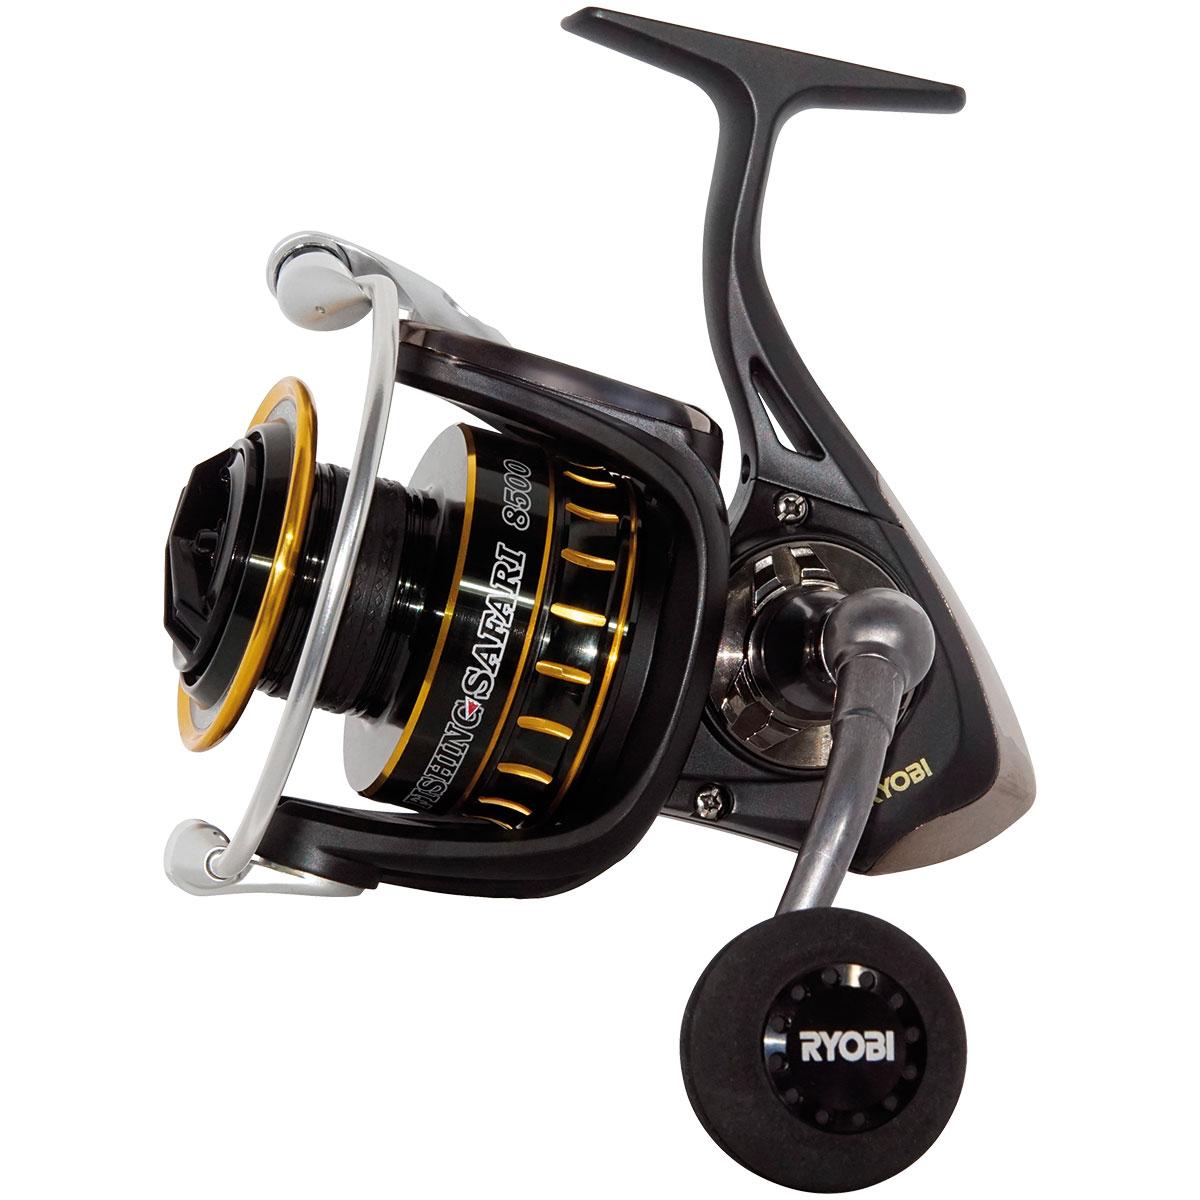 RYOBI Fishing SAFARI Serie 4500, 5500, 6500 & 8500